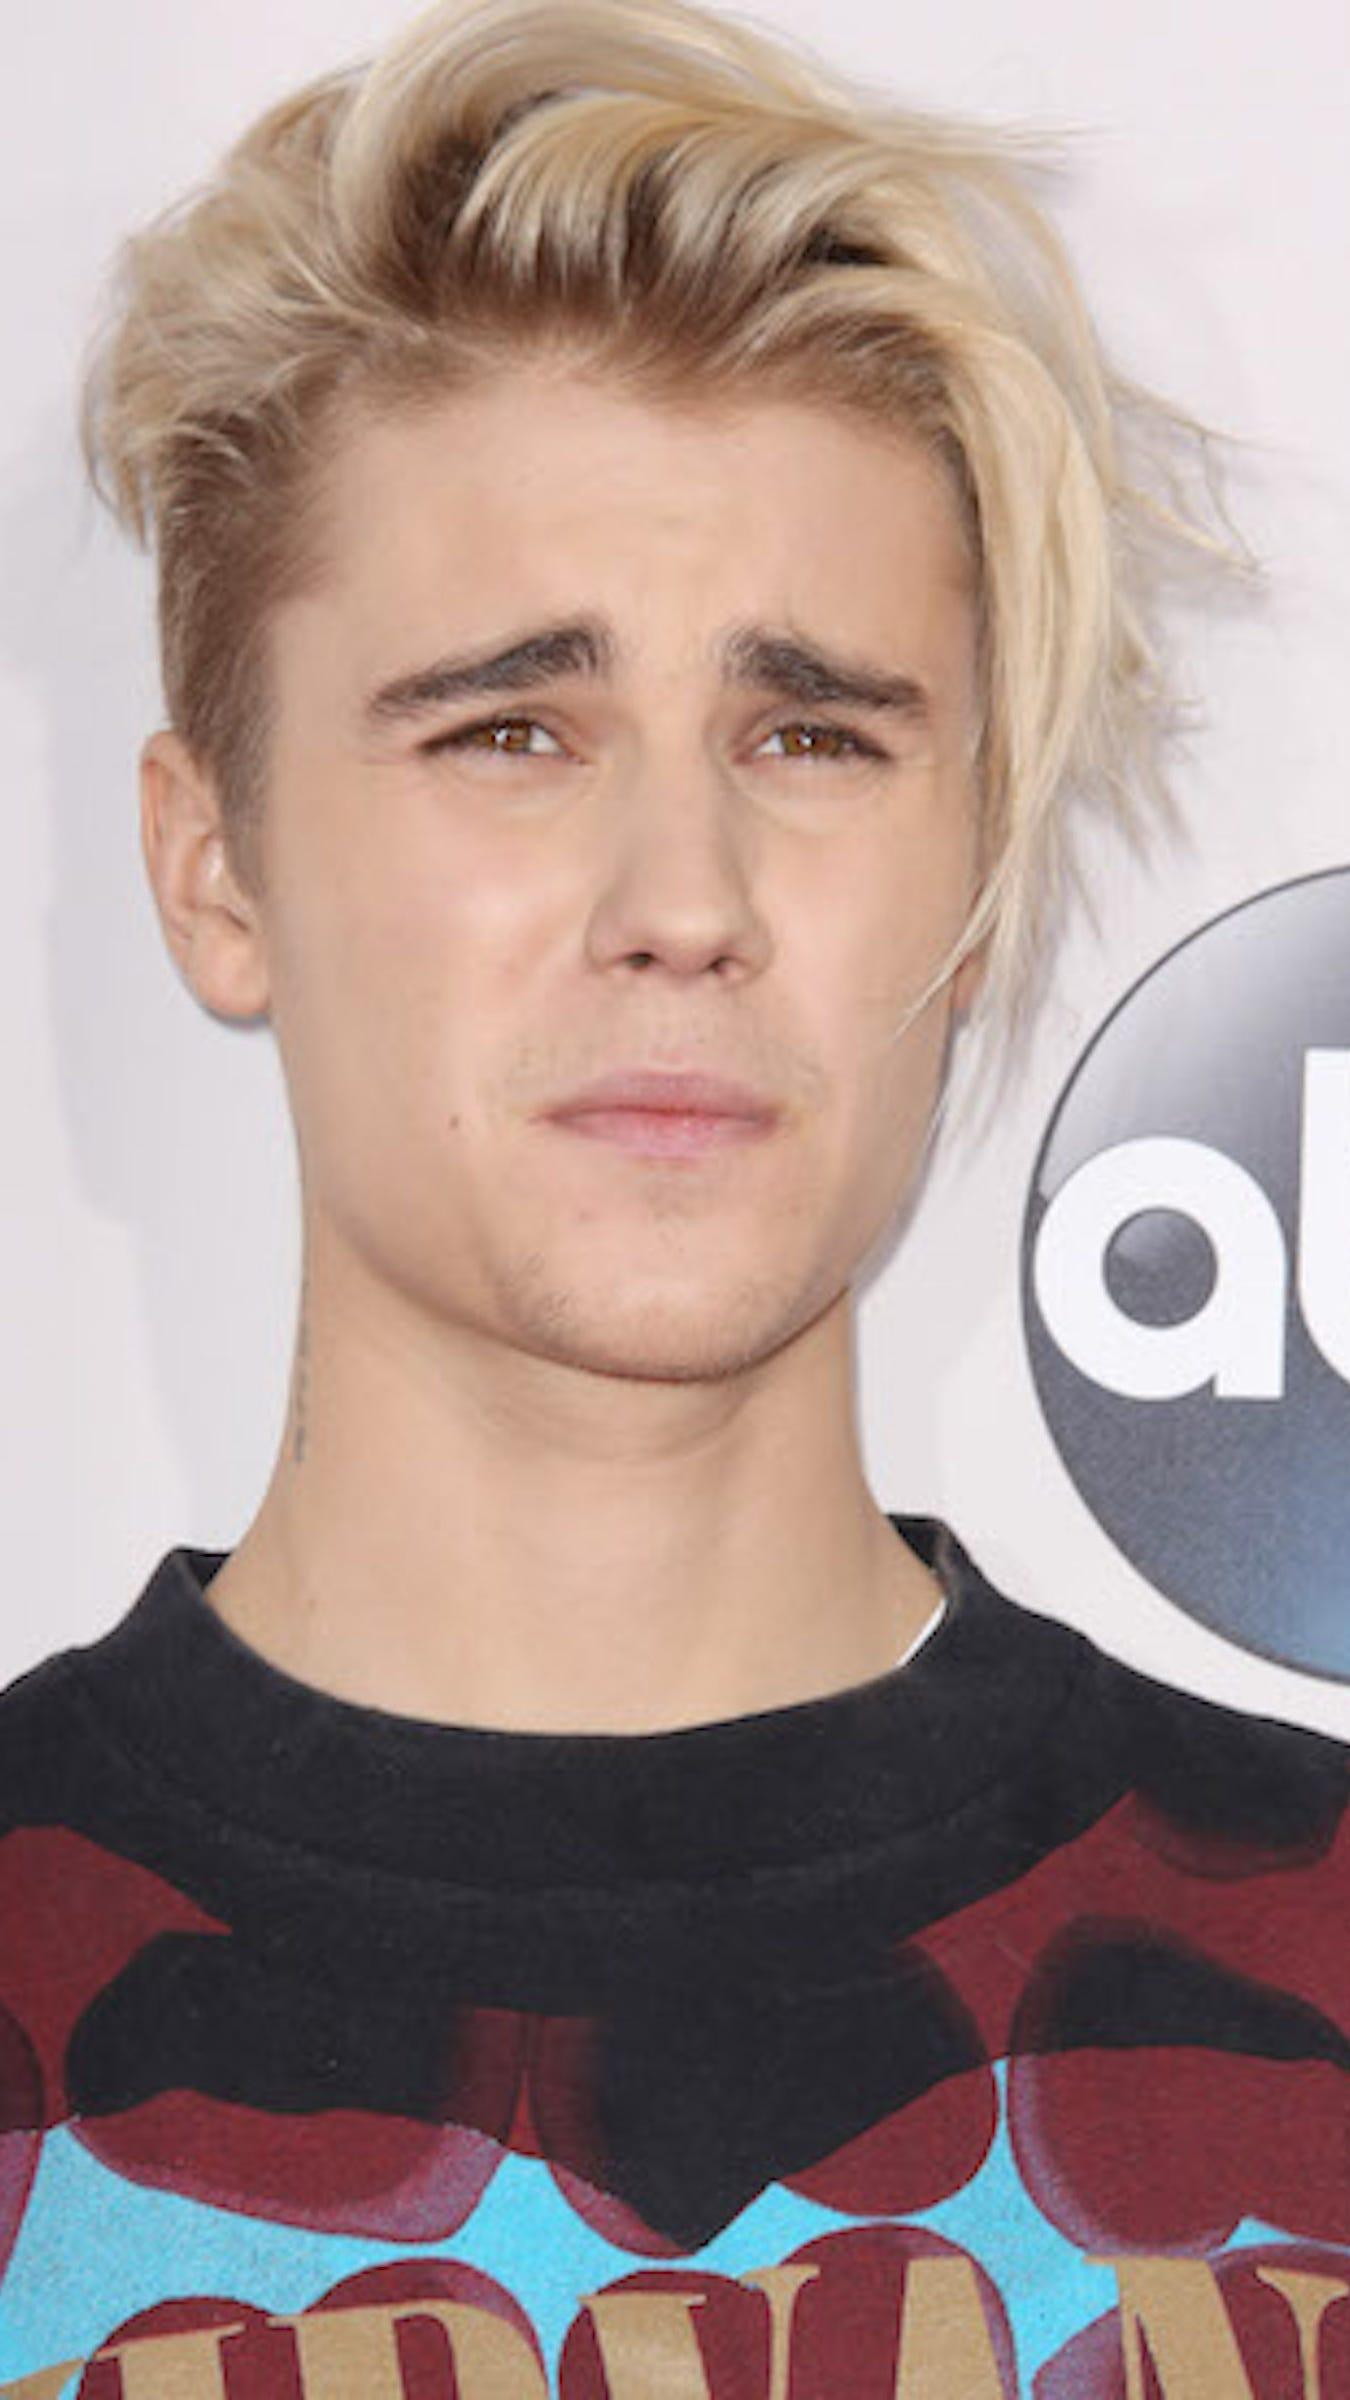 Justin Bieber Superfan Confession - Justin bieber undercut hairstyle 2016